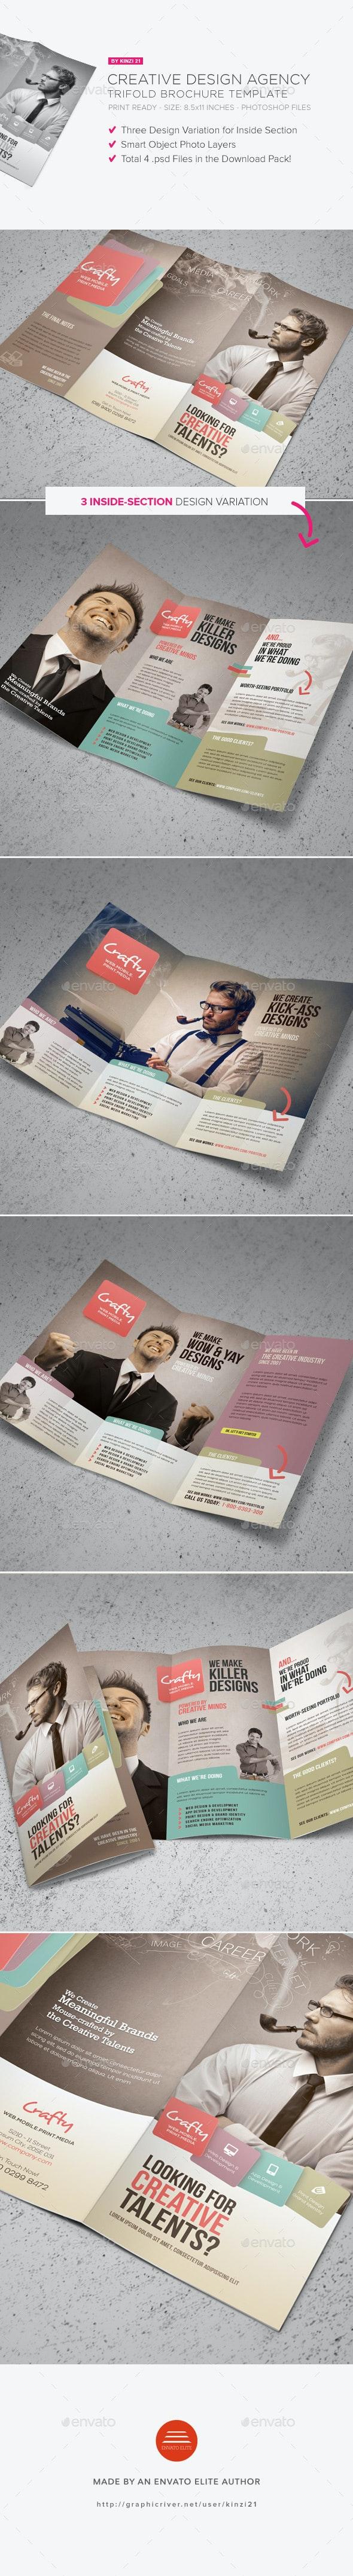 Creative Design Agency Trifold Brochure - Corporate Brochures